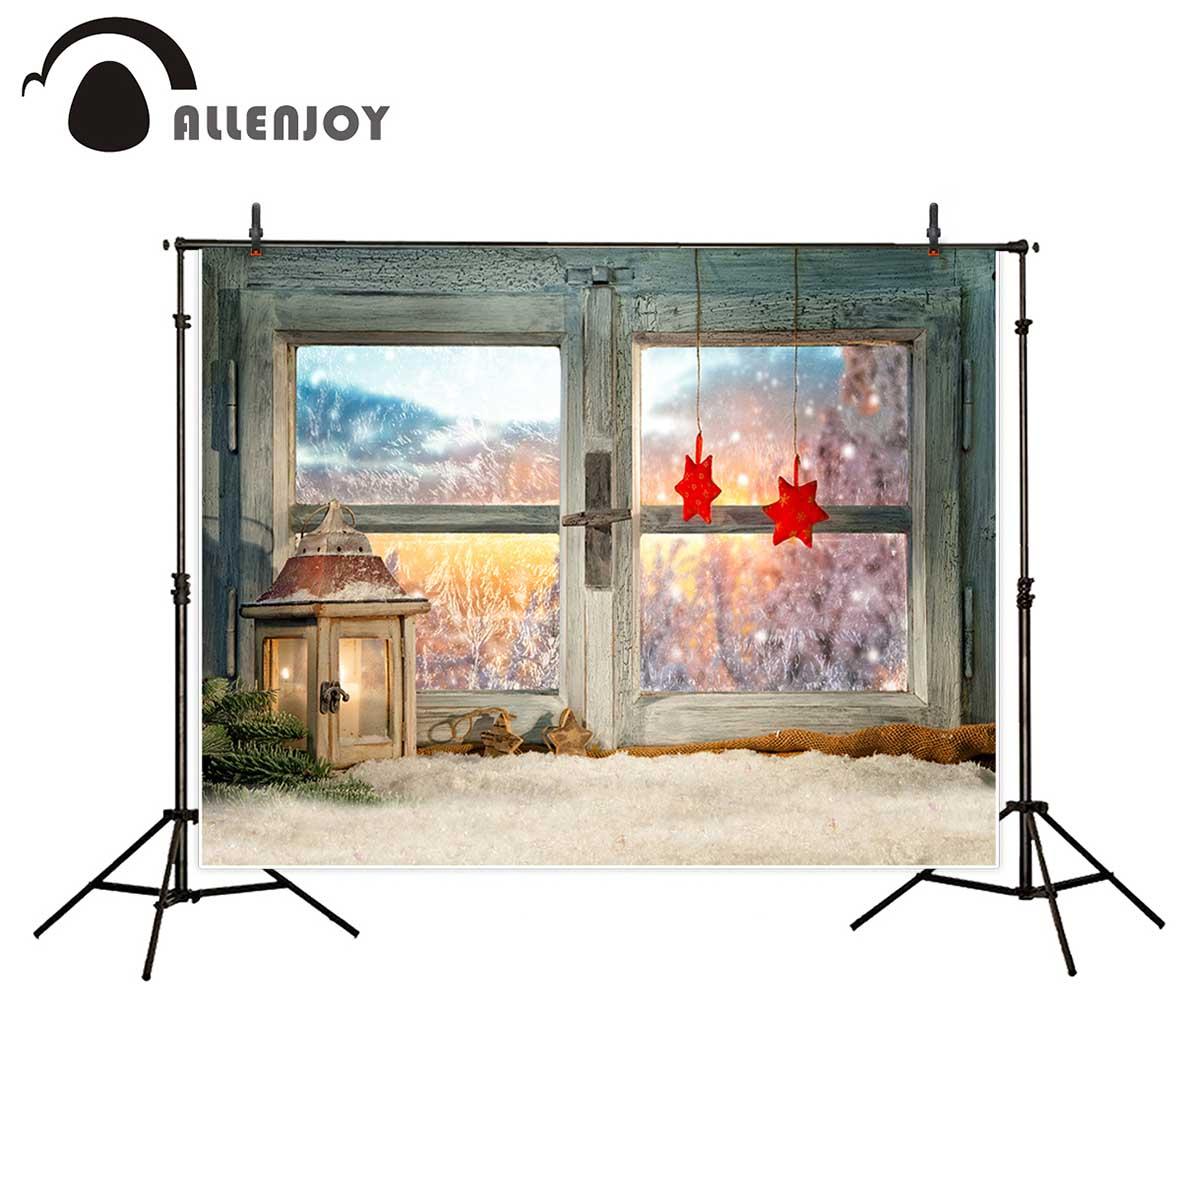 Allenjoy photography background atmospheric christmas window sill decoration beautiful sunset backdrop Photo background studio